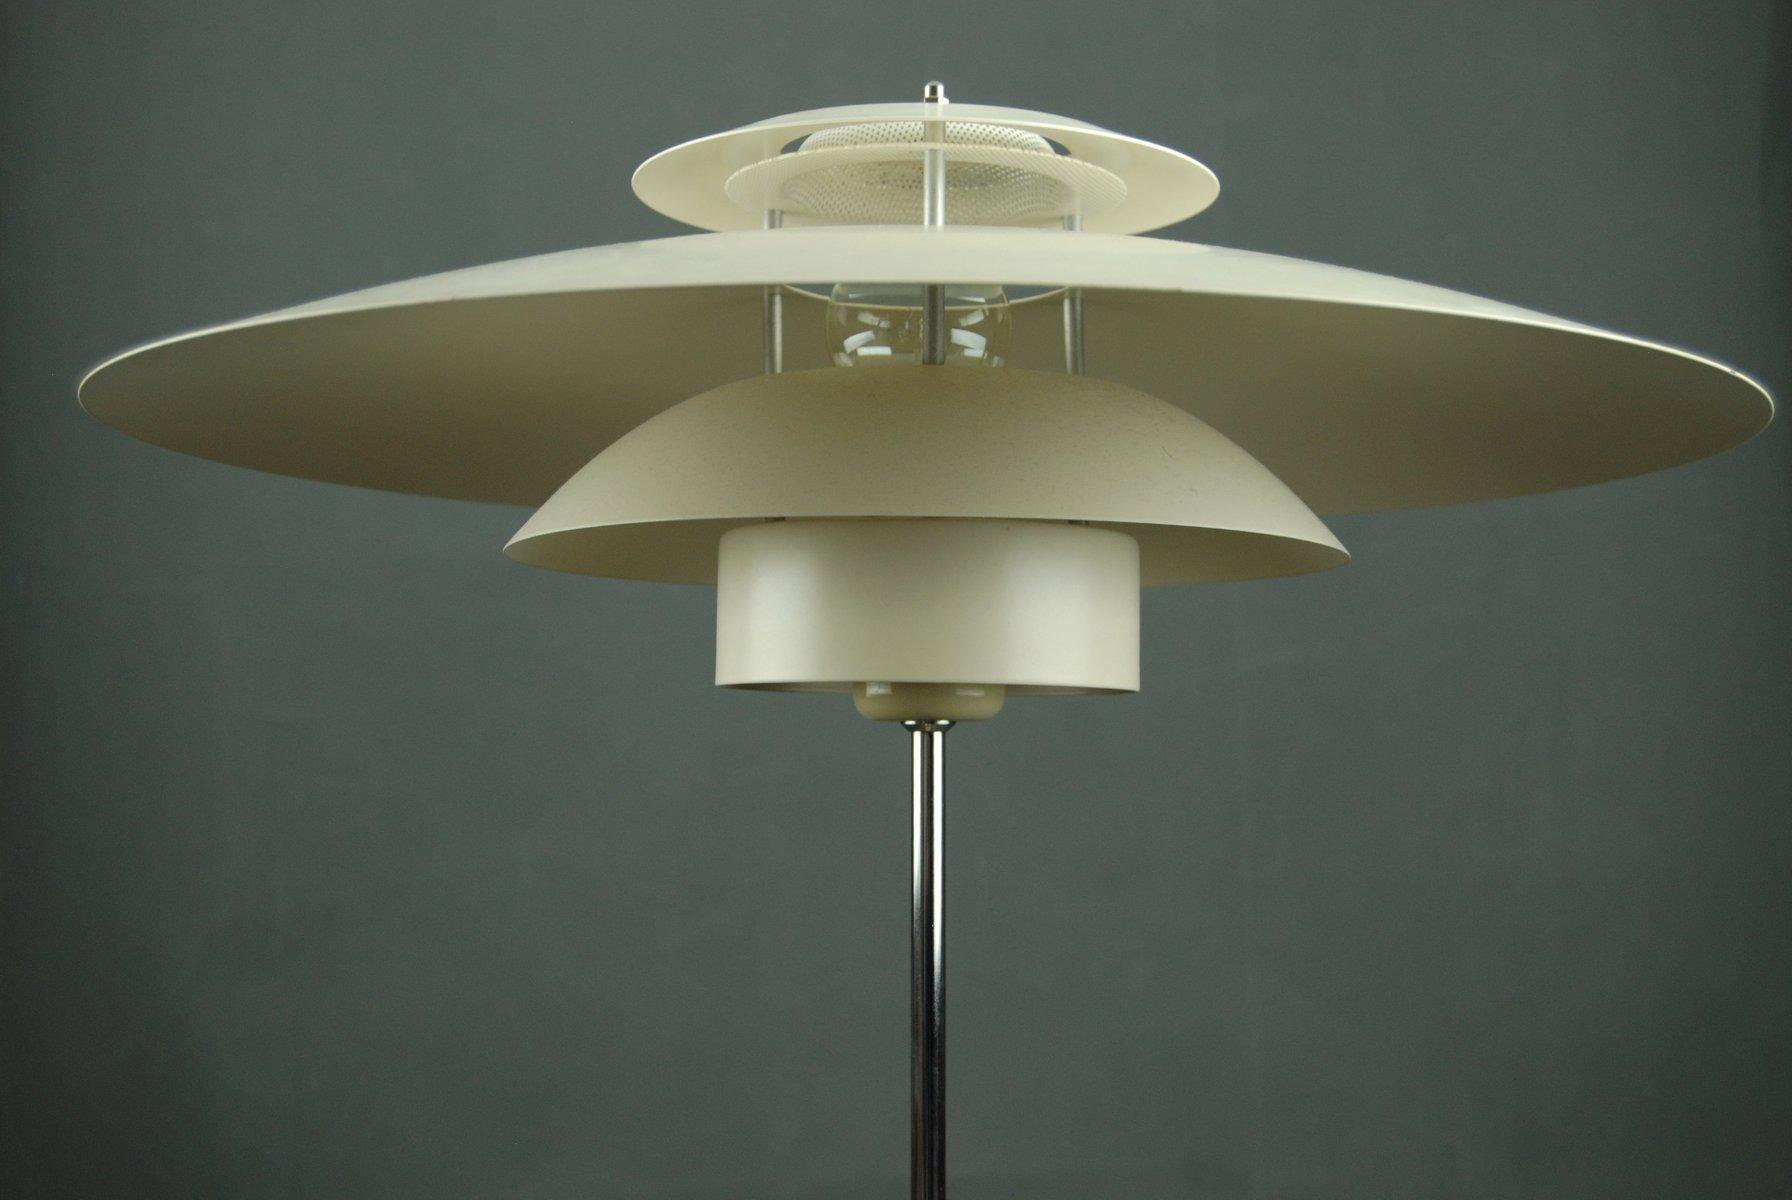 Lampada da terra Korfu vintage di Design Light AS, Danimarca, anni '80 in vendita su Pamono